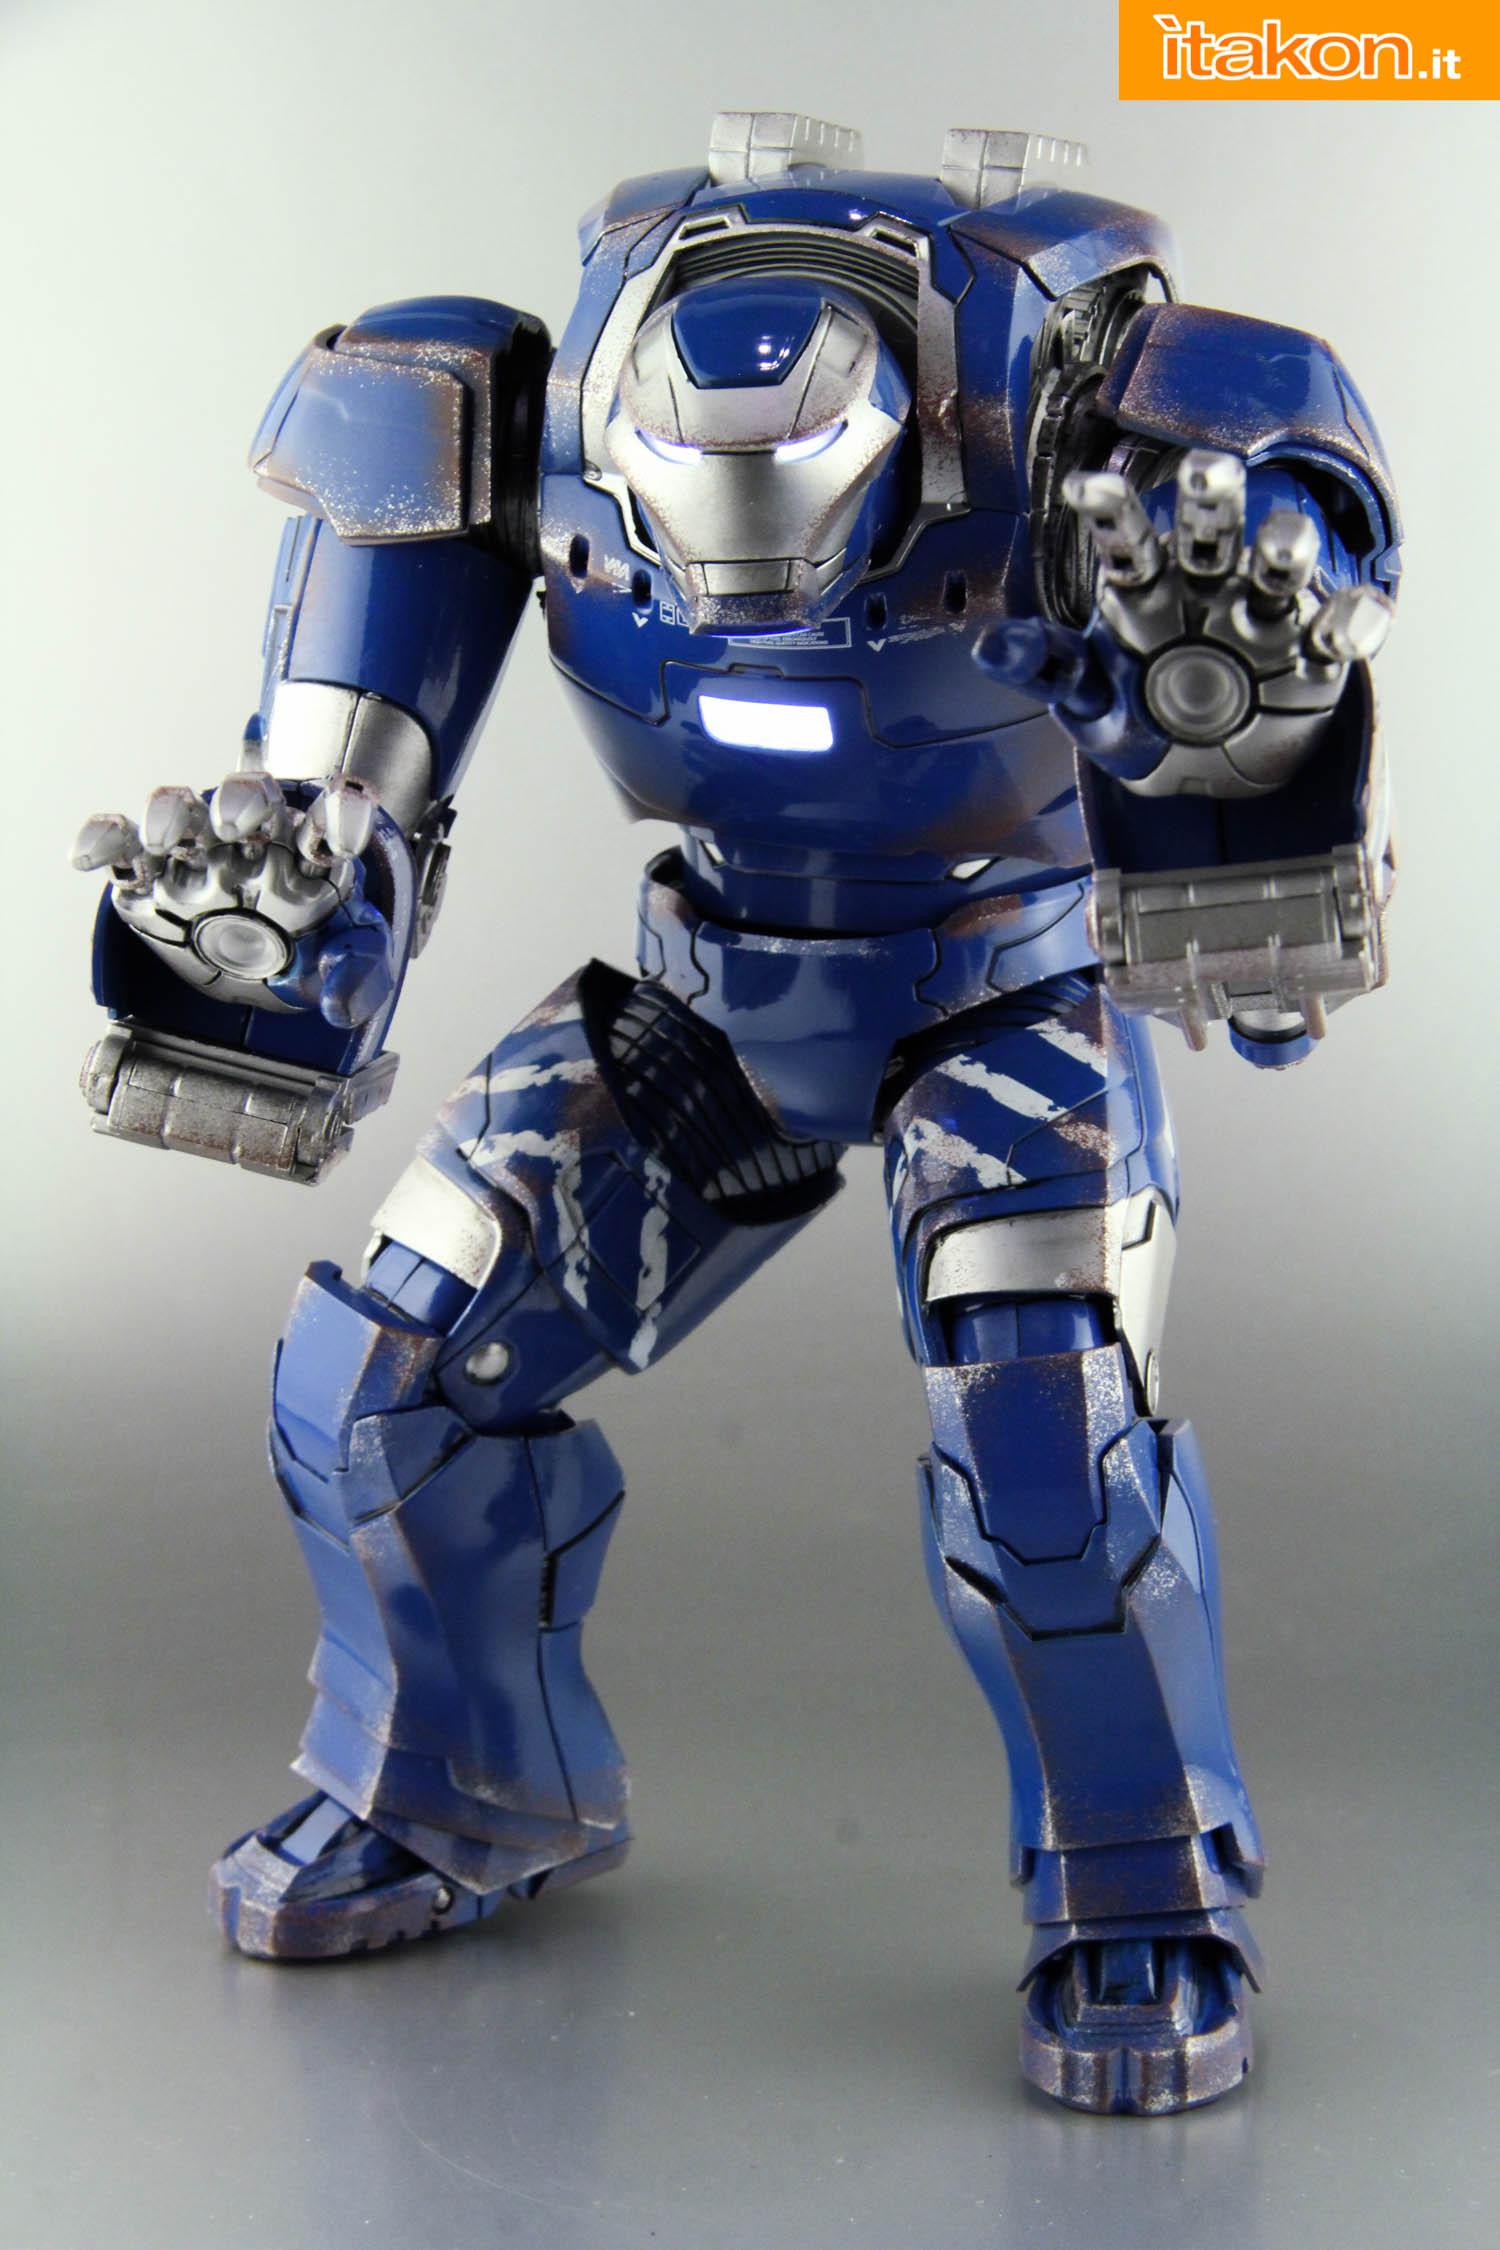 Link a comicave-igor-iron-man-figure-51